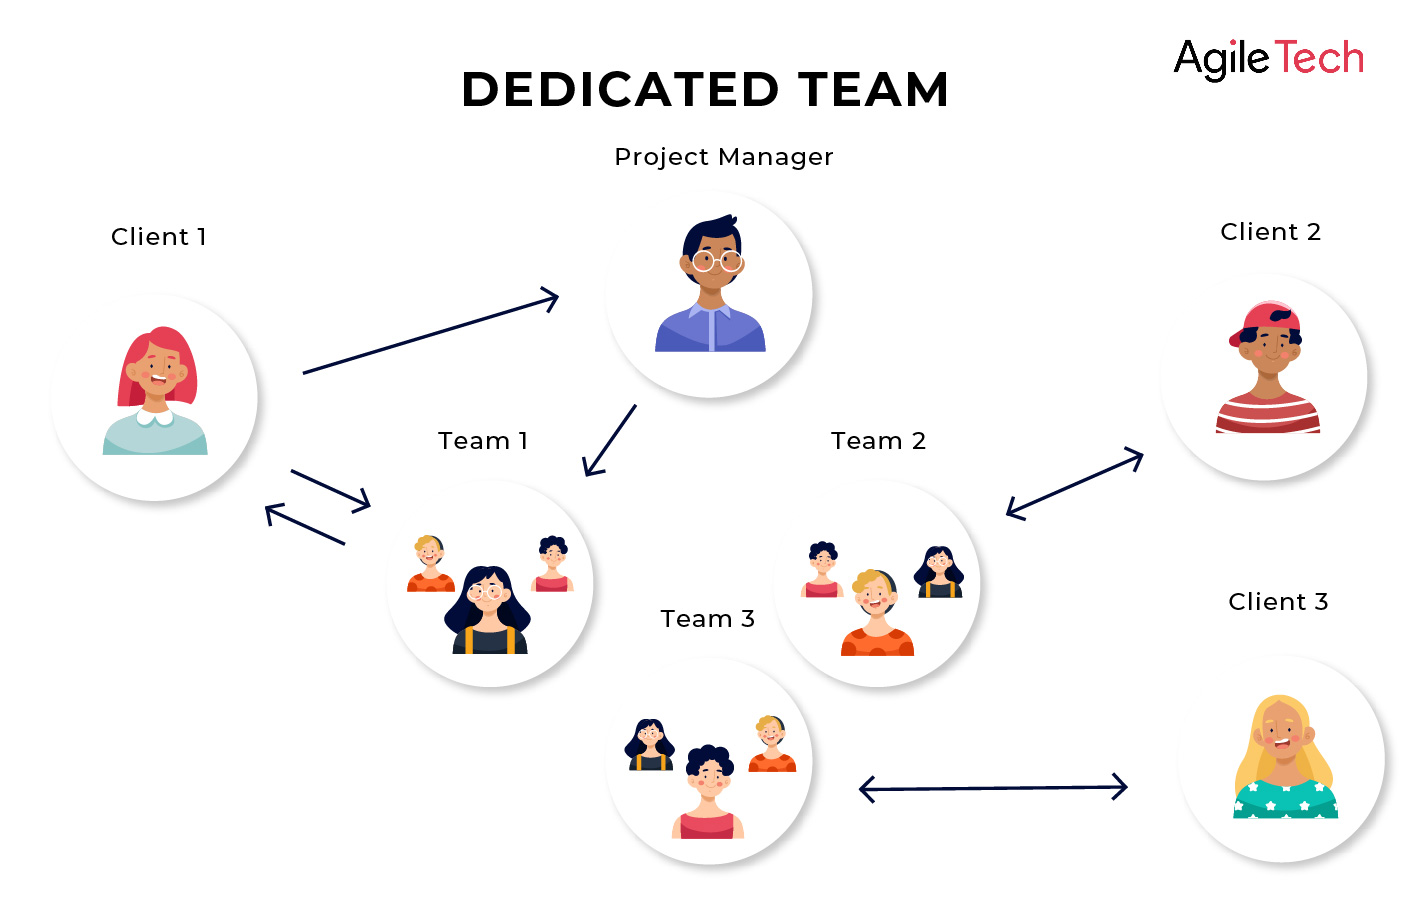 hire a dedicated team software development company in vietnam agiletech